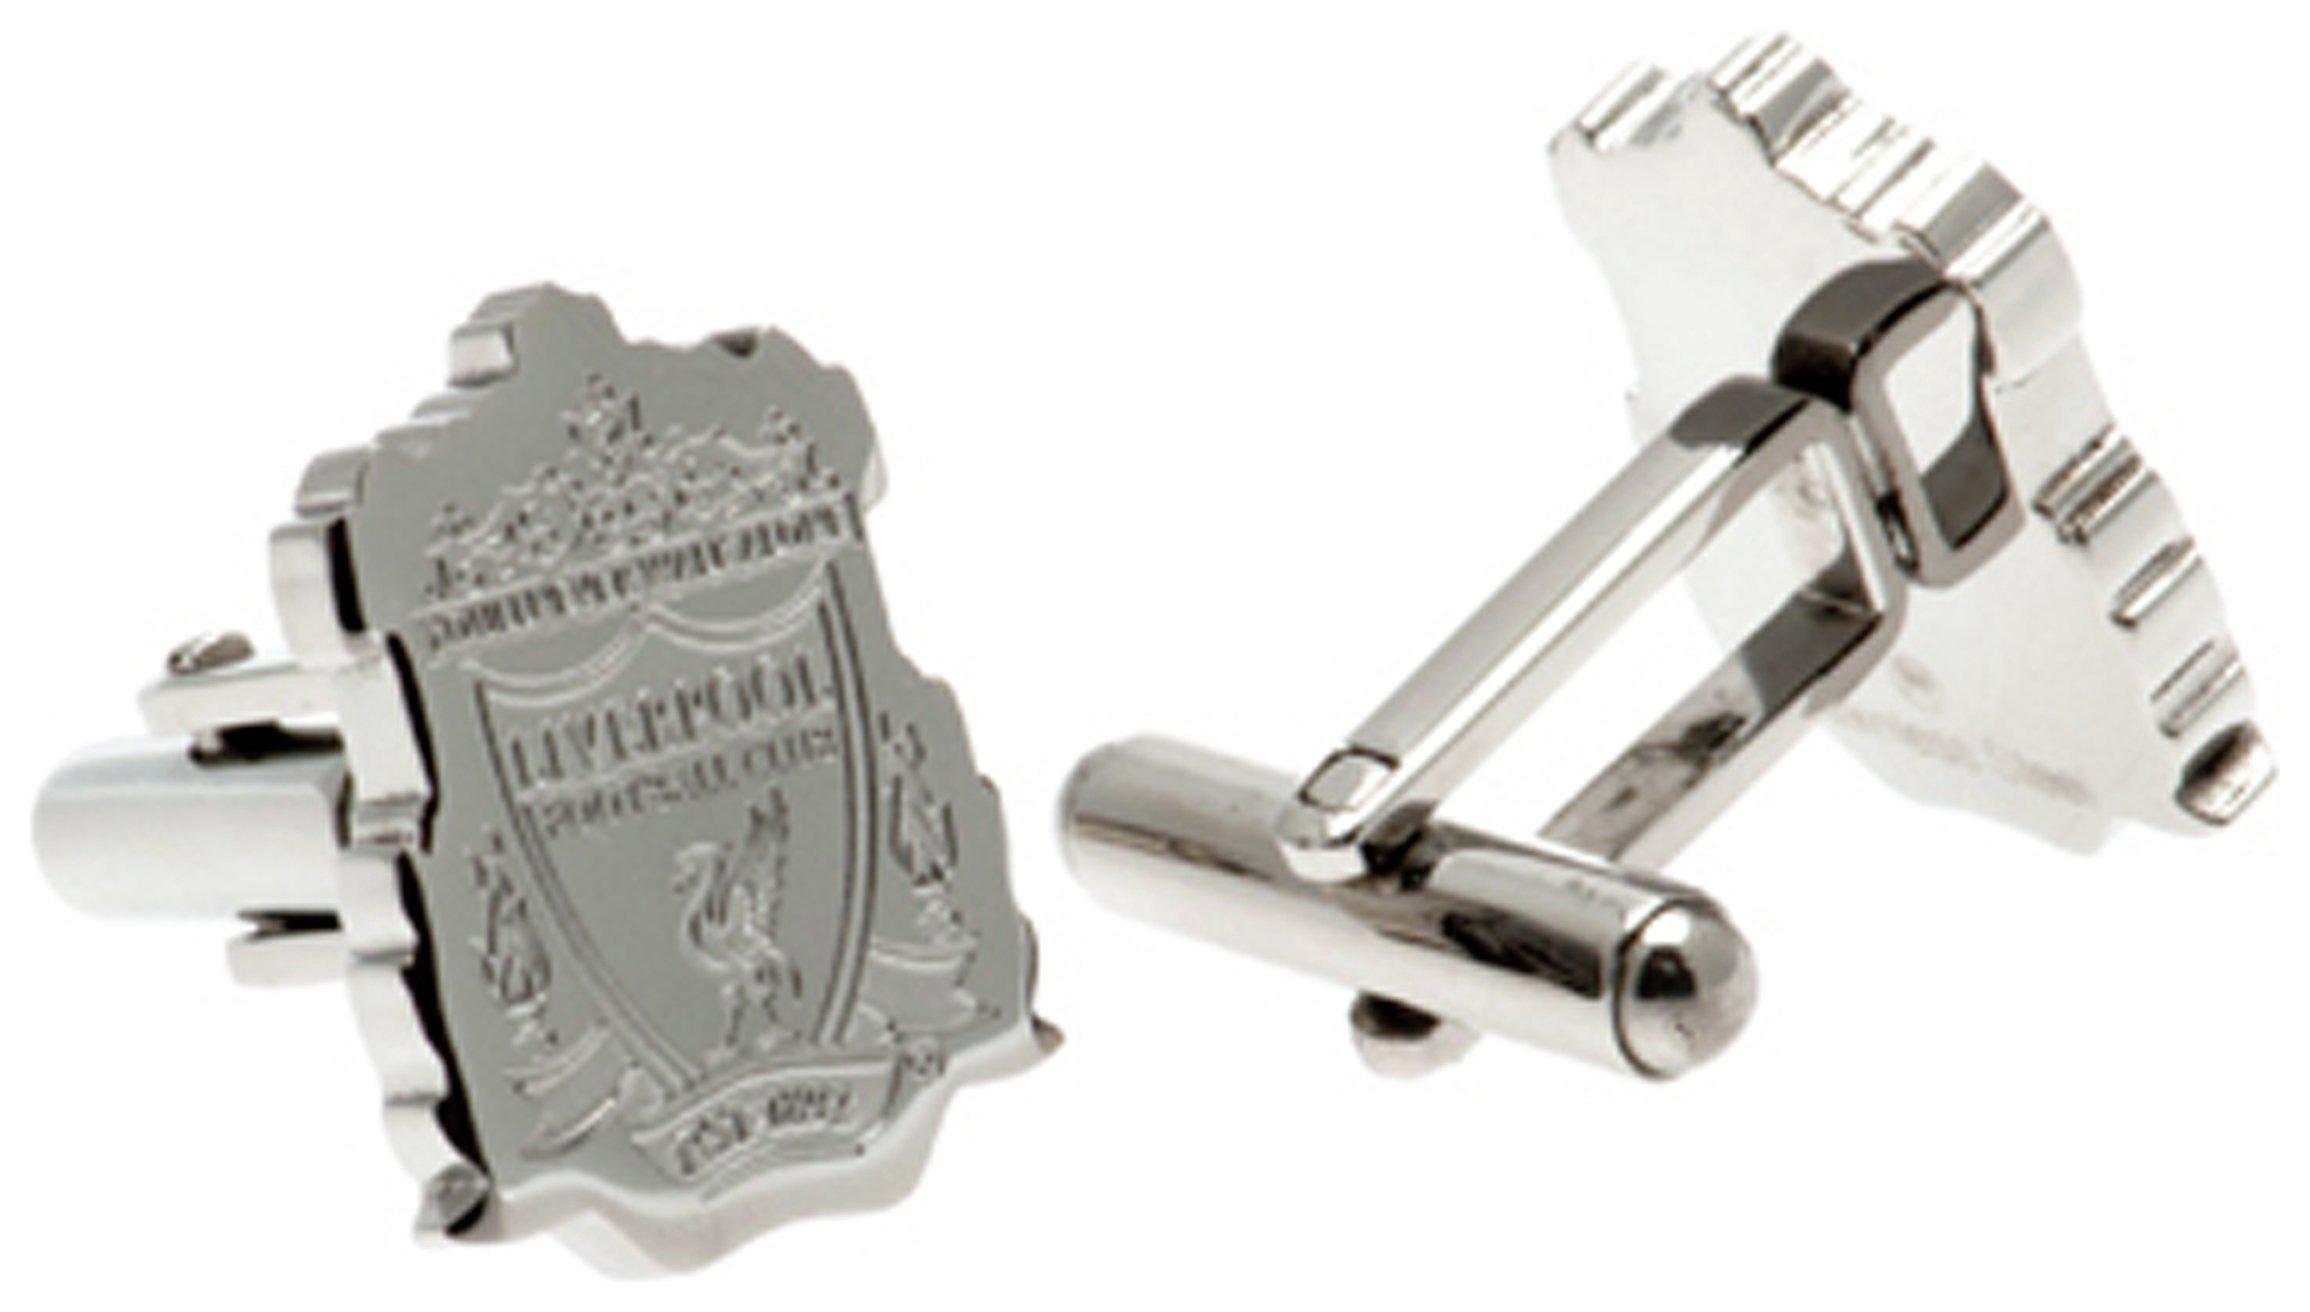 liverpool-fc-crest-stainless-steel-cufflinks